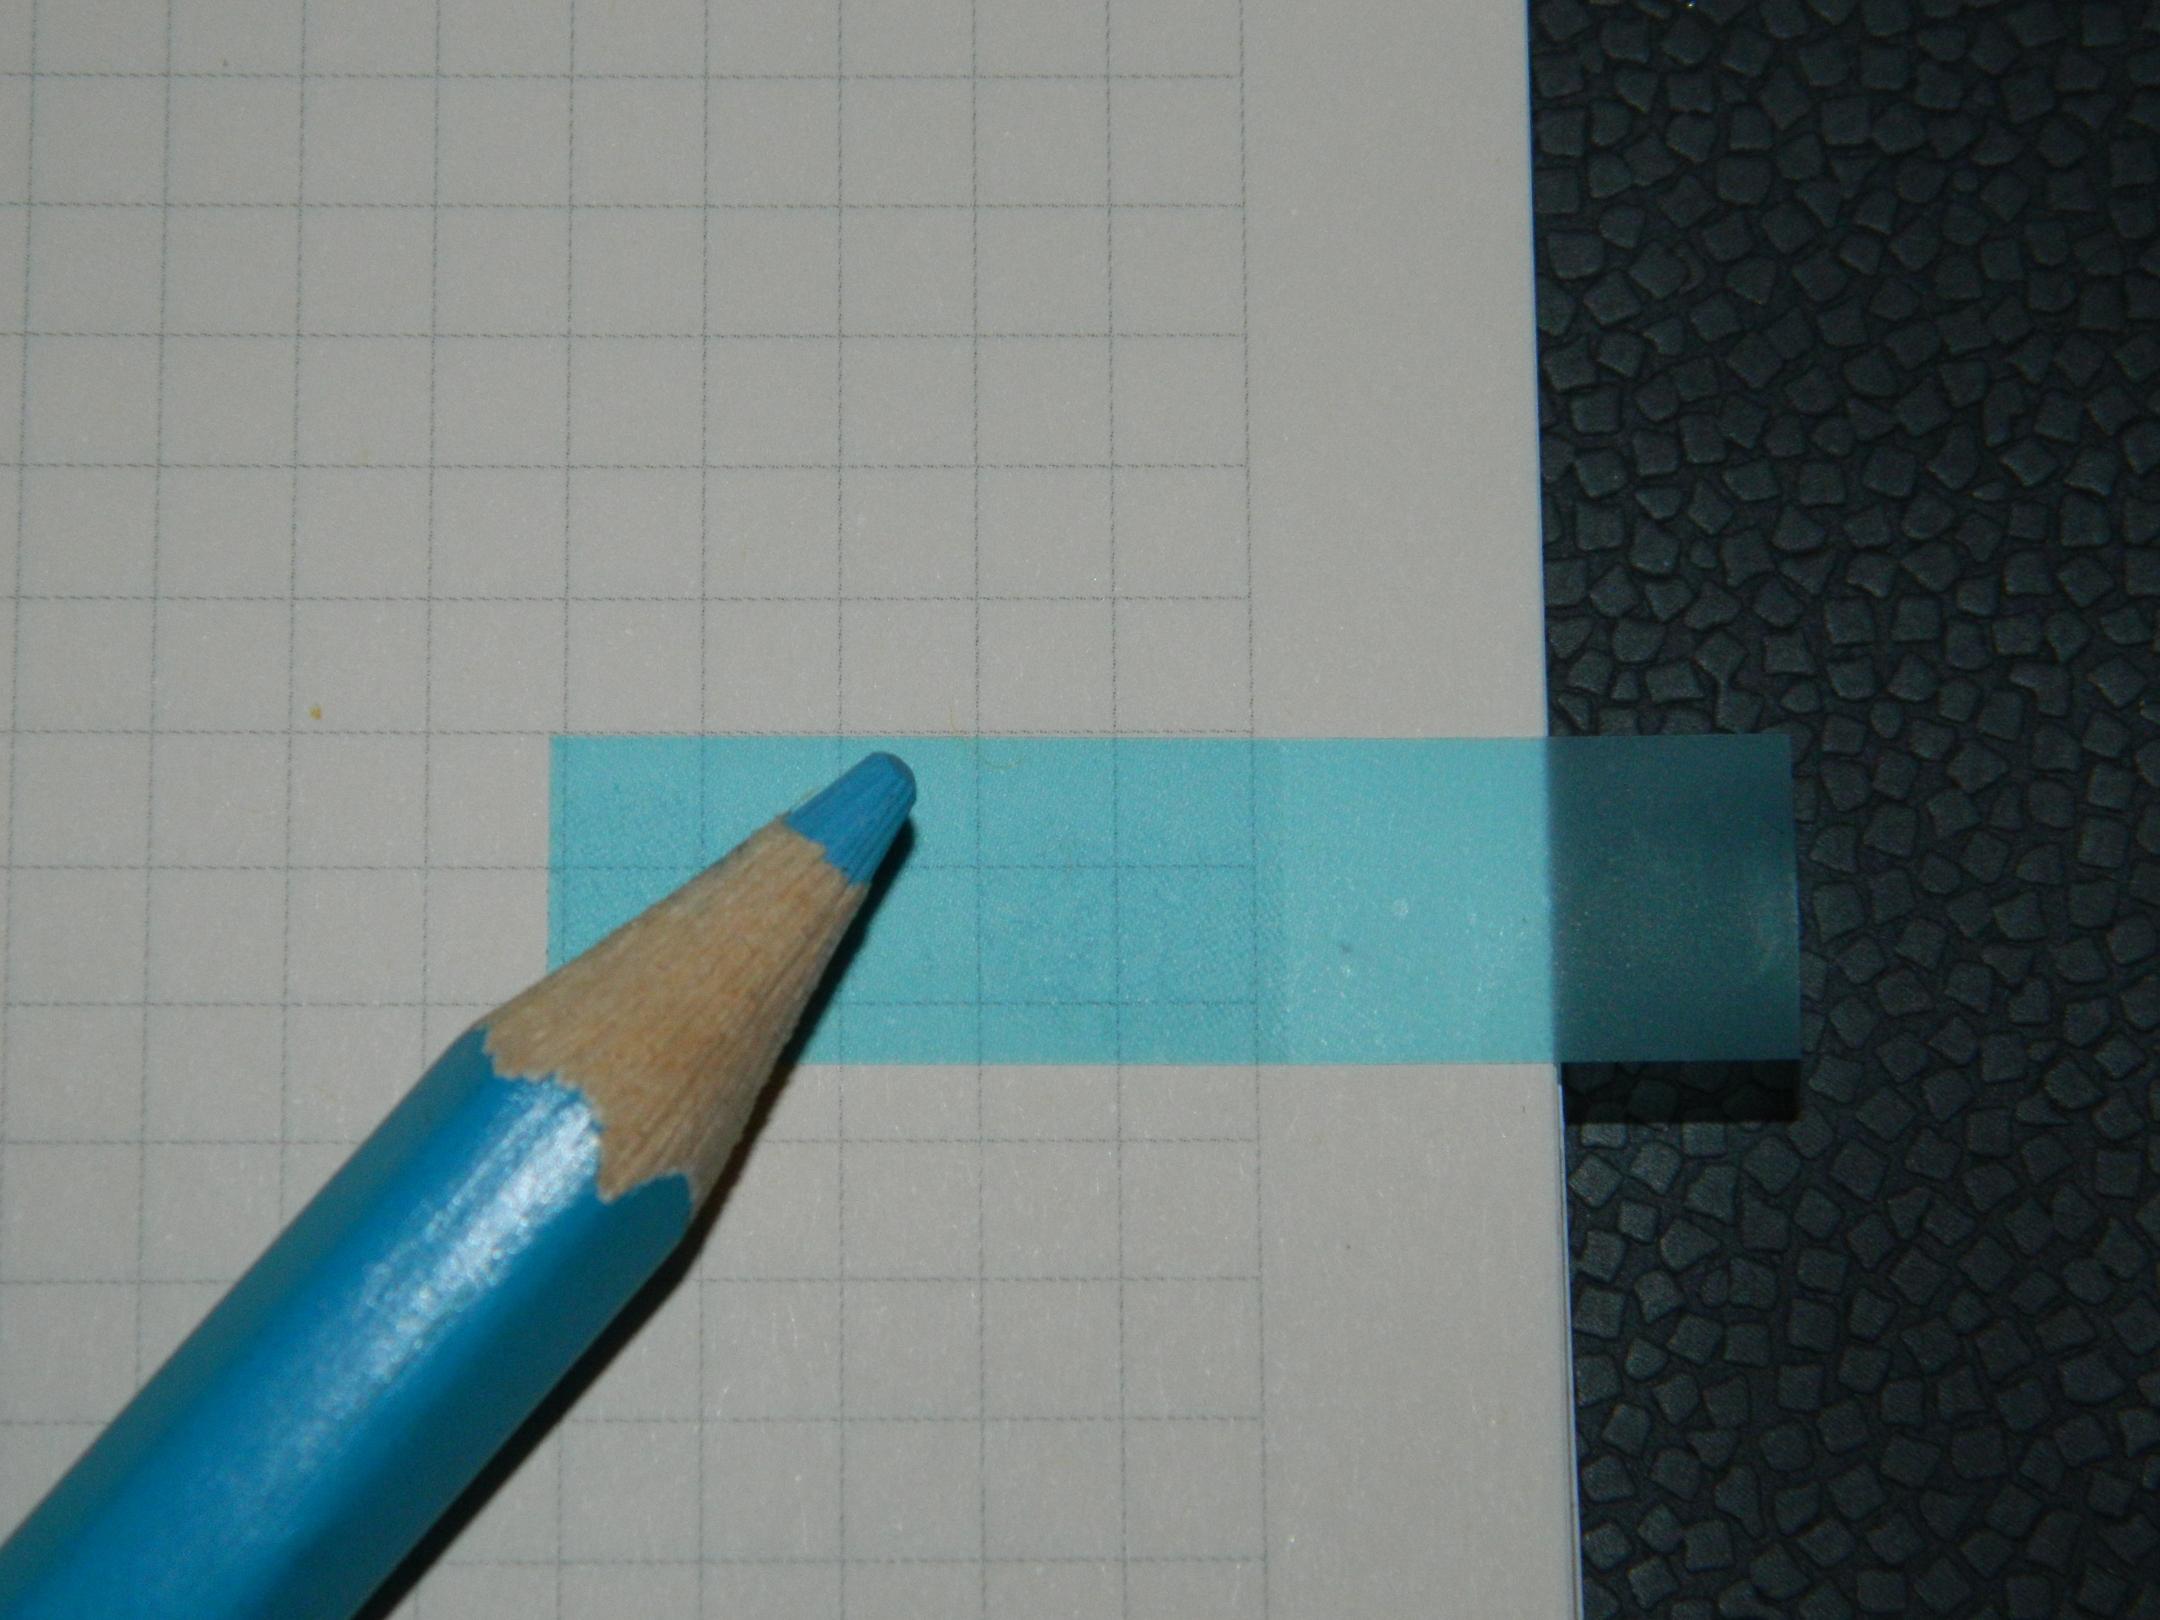 Blue Pencil, Paper, Pencil, Notebook, Color, HQ Photo